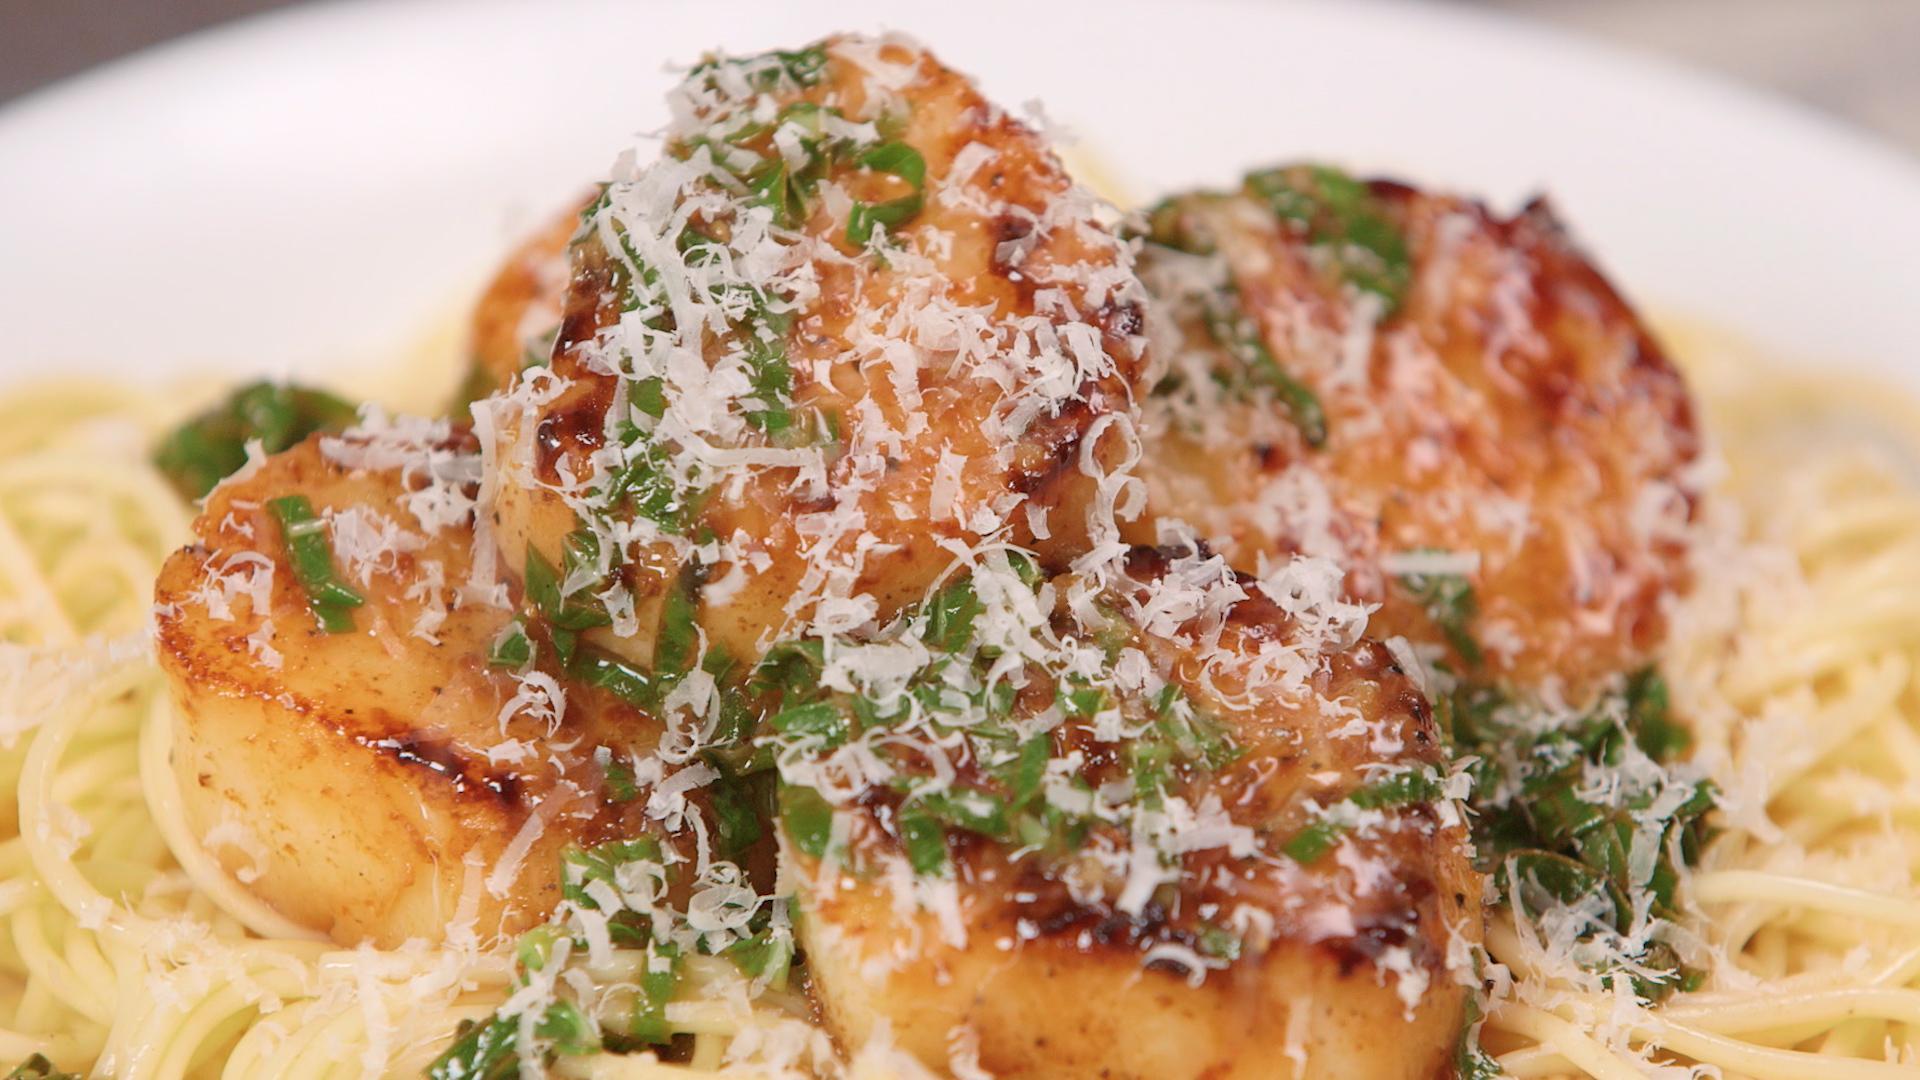 Scallops with lemon basil sauce recipe myrecipes forumfinder Images